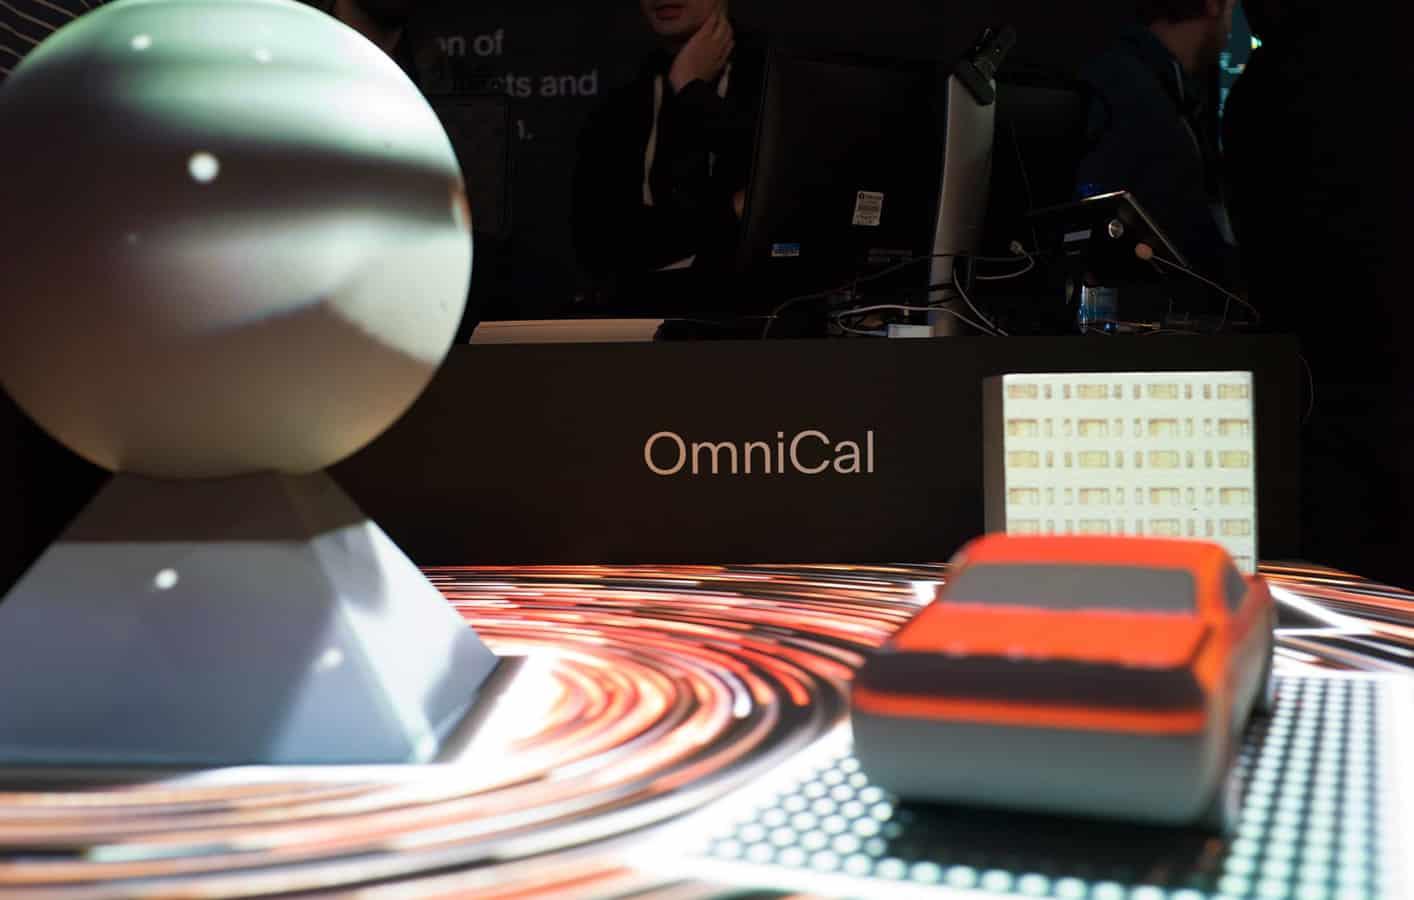 OmniCal